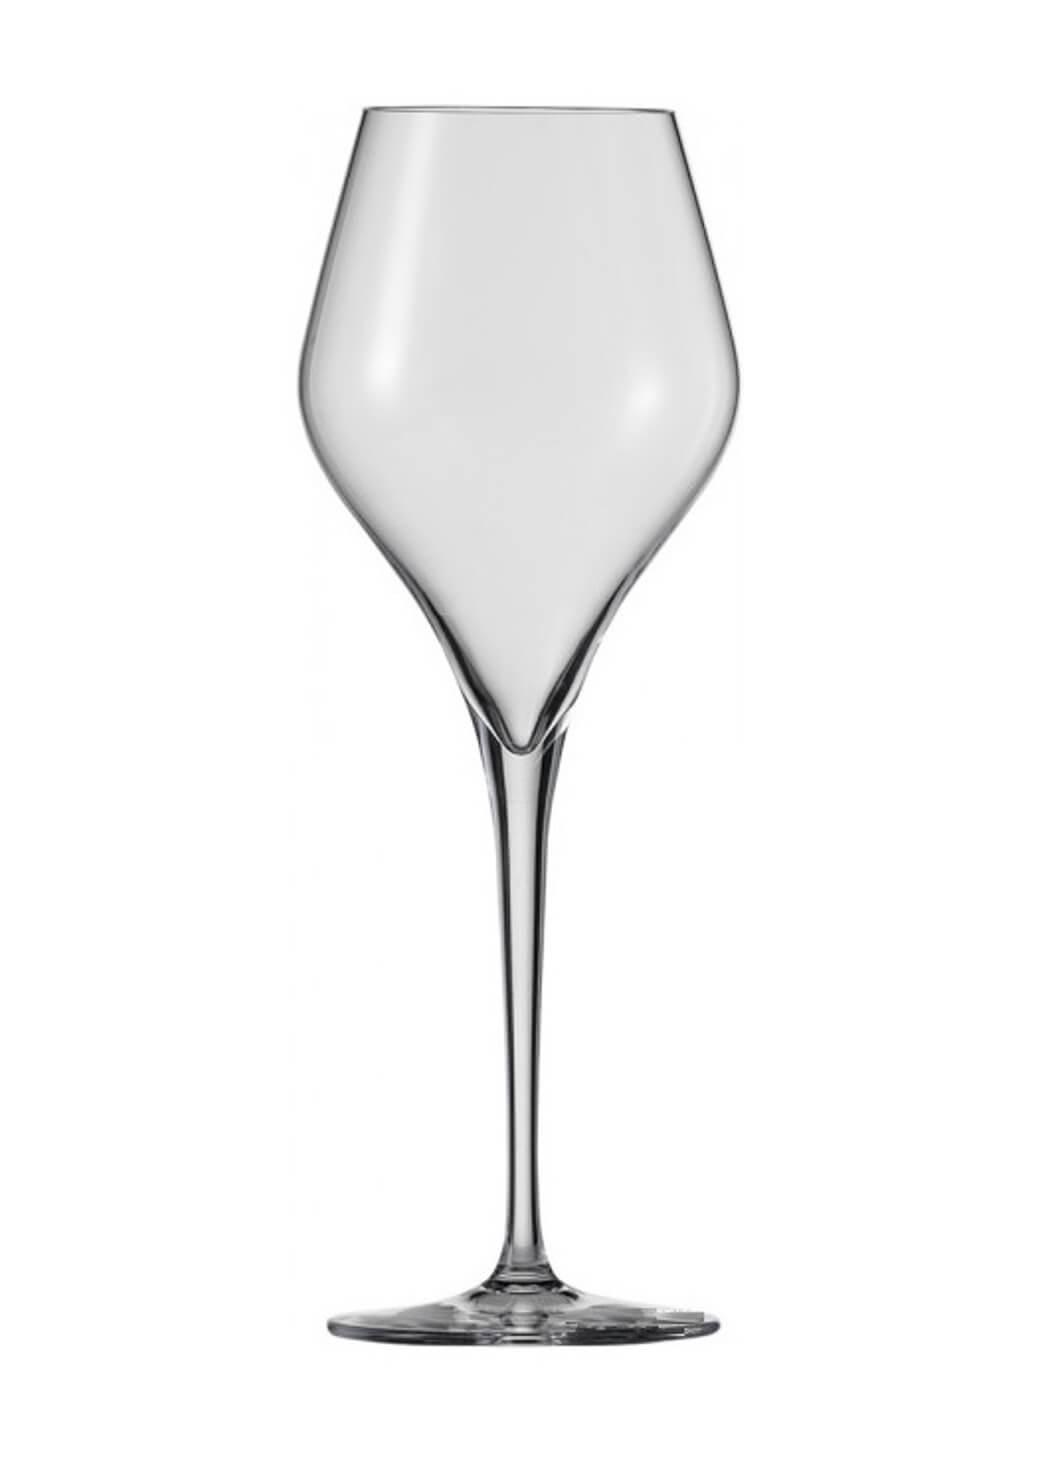 Онлайн каталог PROMENU: Бокал для белого вина Riesling Schott Zwiesel Finesse, объем 0,316 л                                   118604